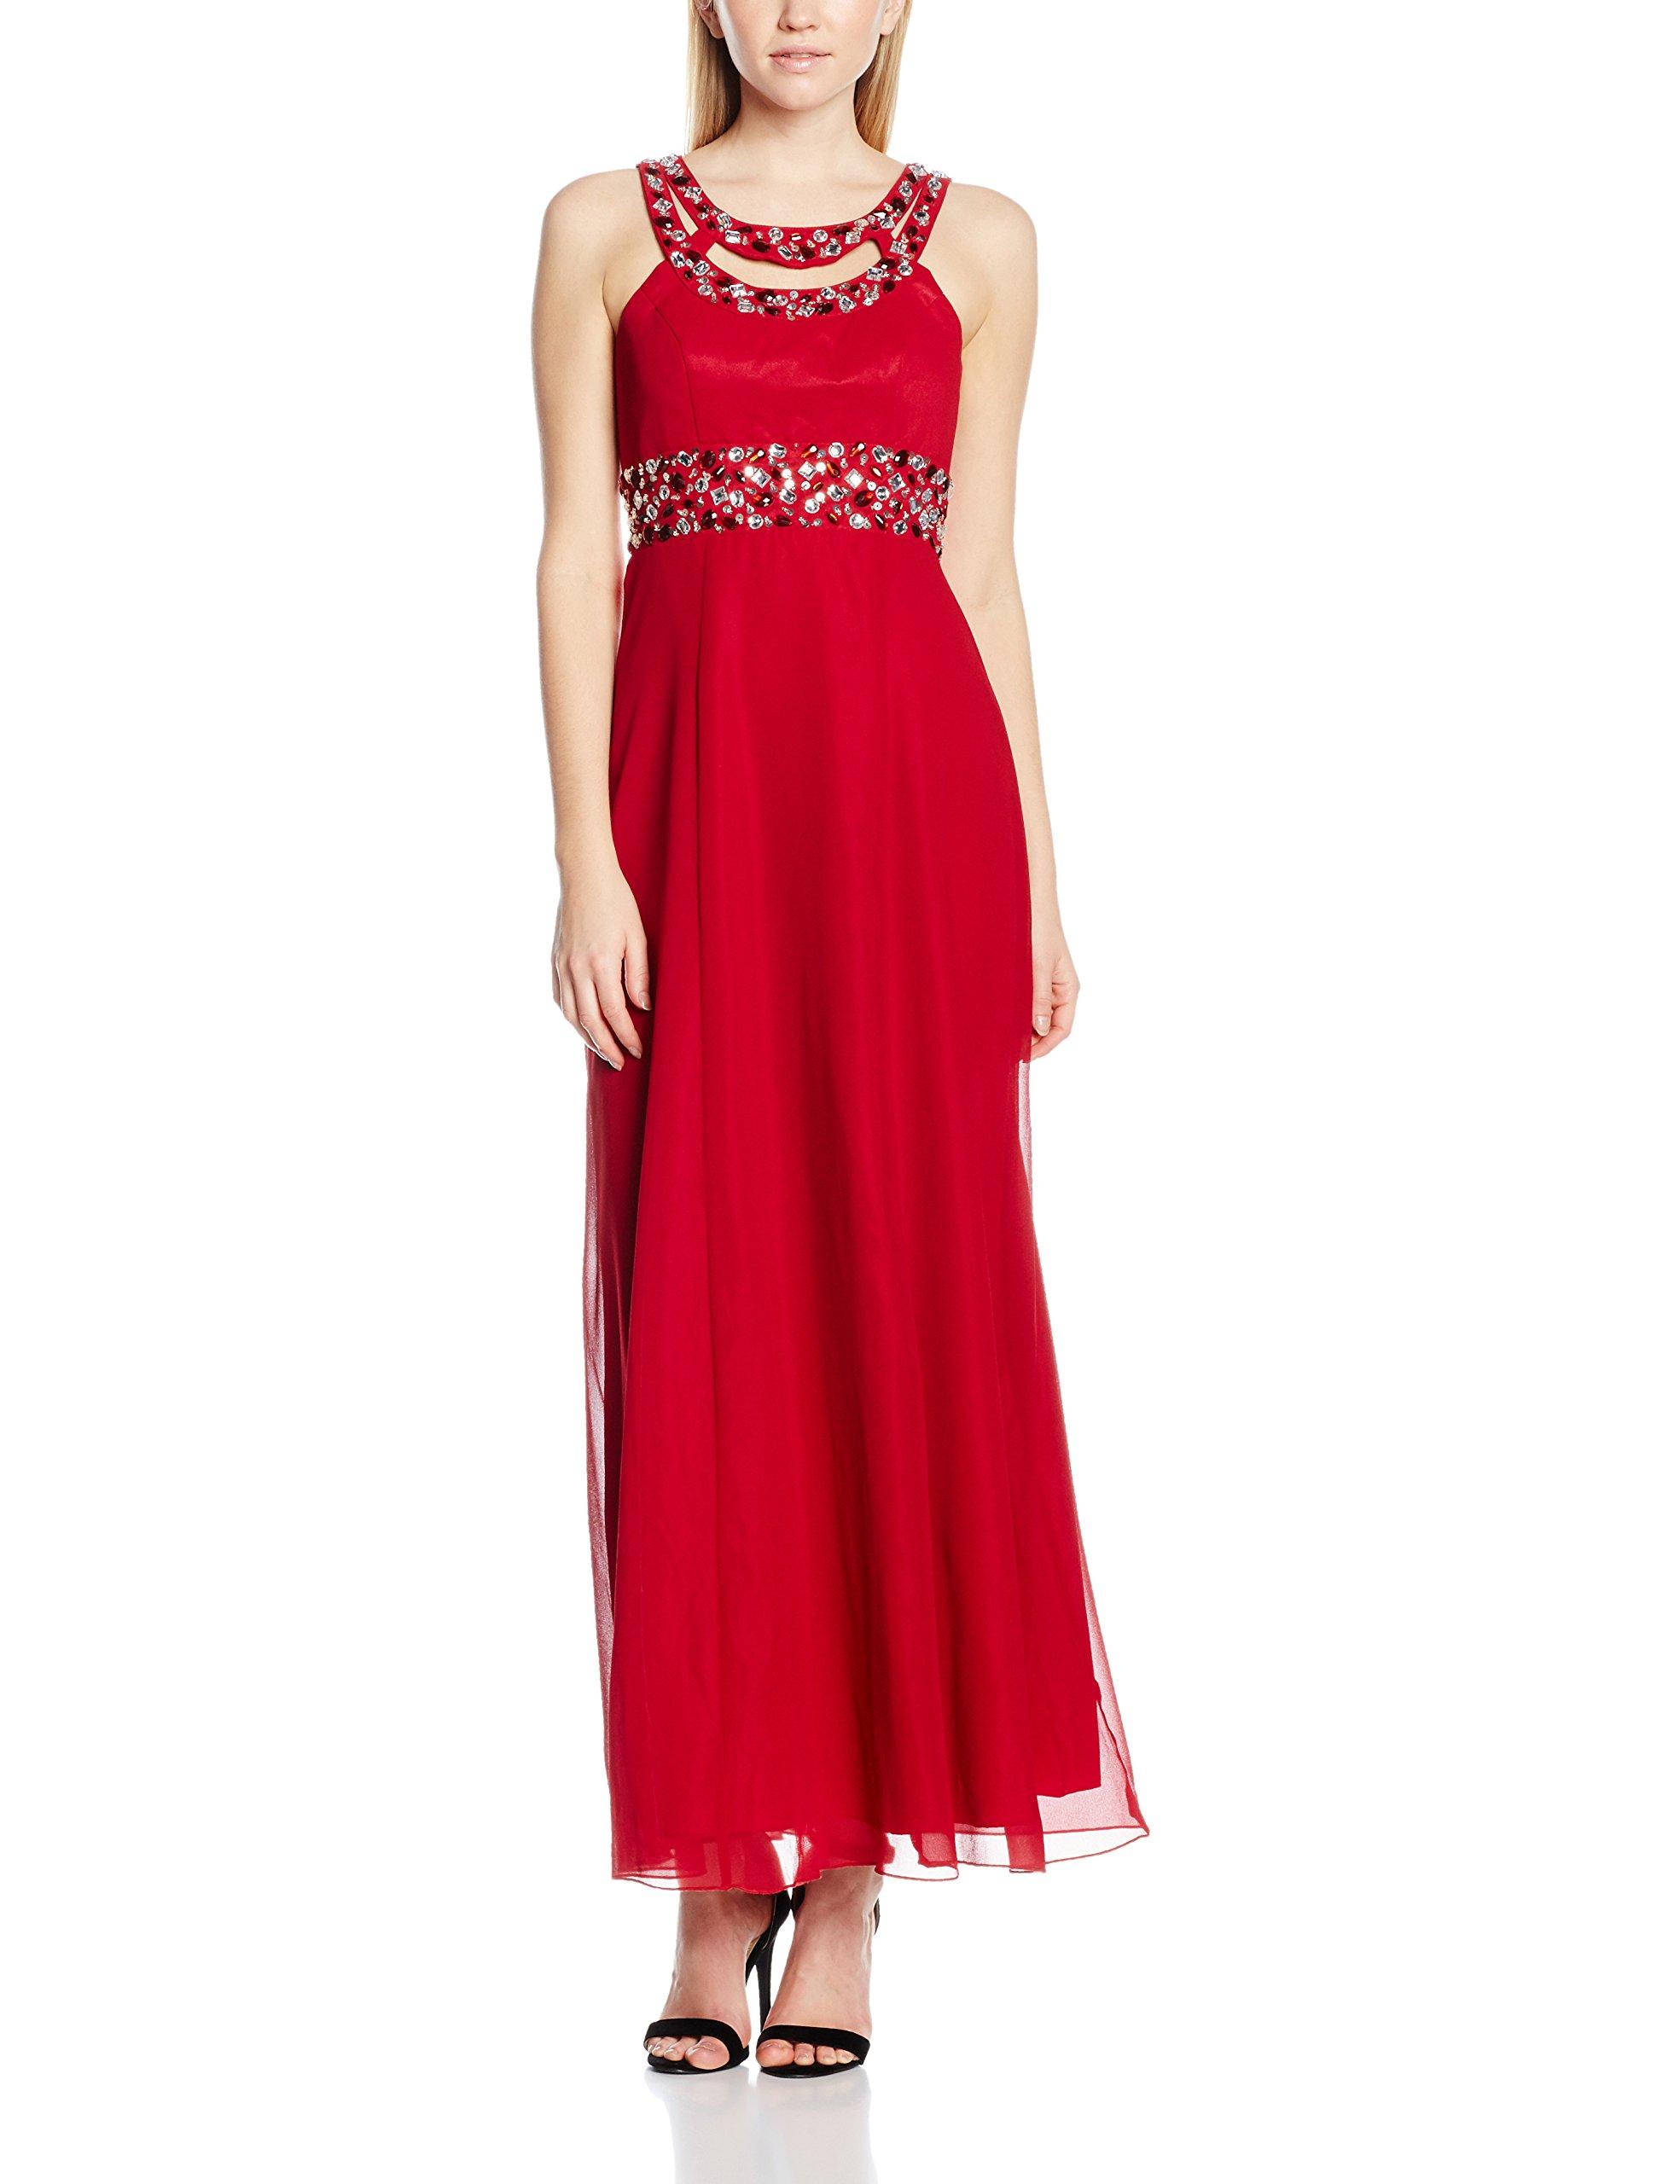 Evening Dress Veronica De Fête E42 Femme soiréeRedburgundy Robes My 5A4Lj3R